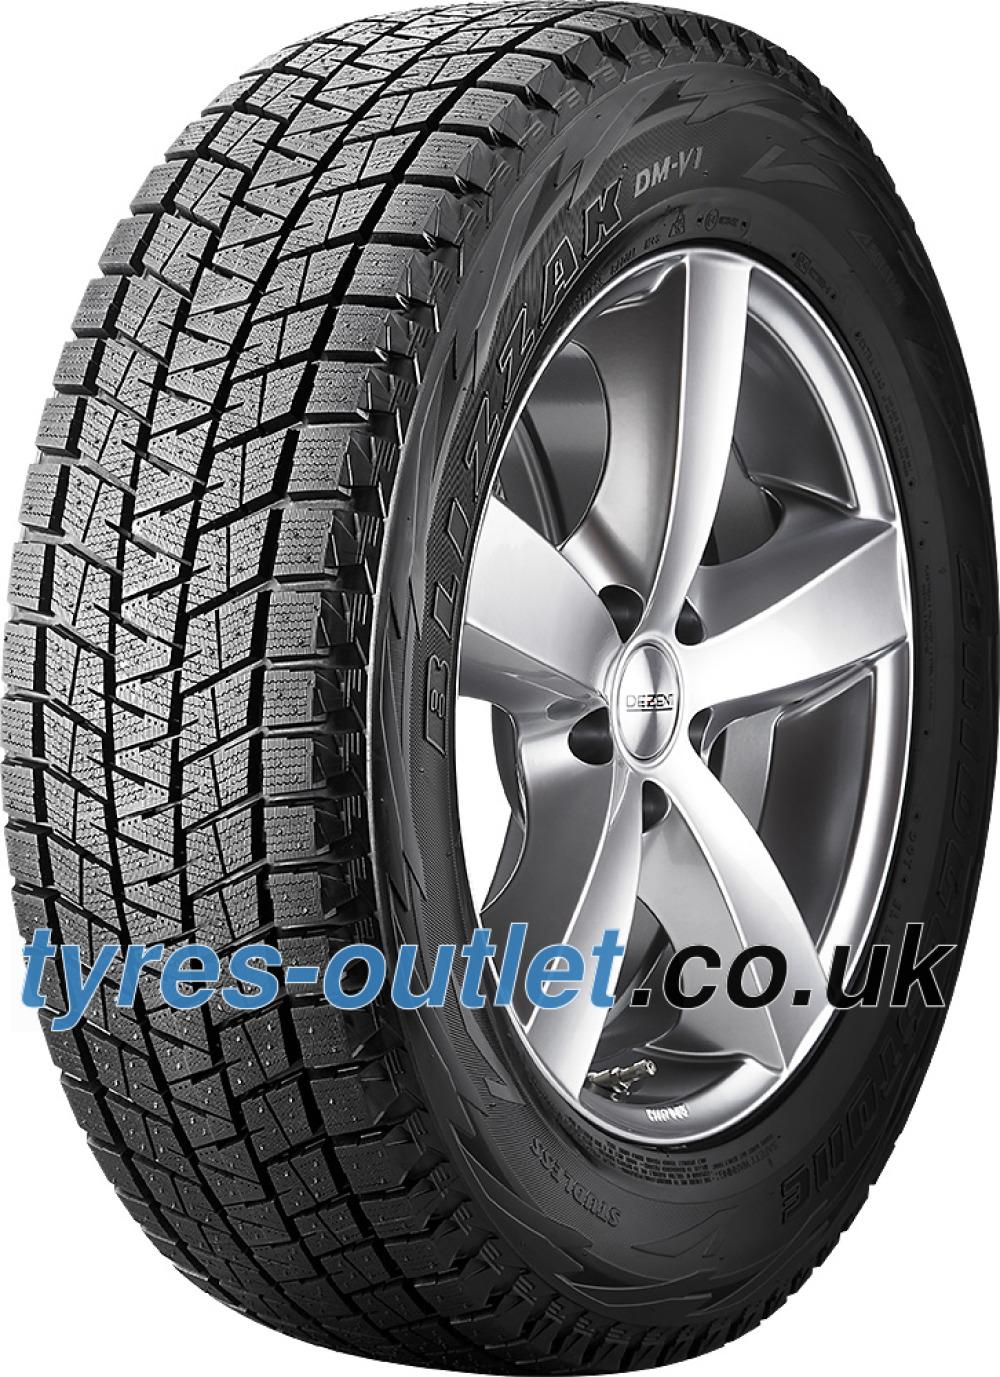 Bridgestone Blizzak DM V1 ( 235/60 R16 100R RBT )